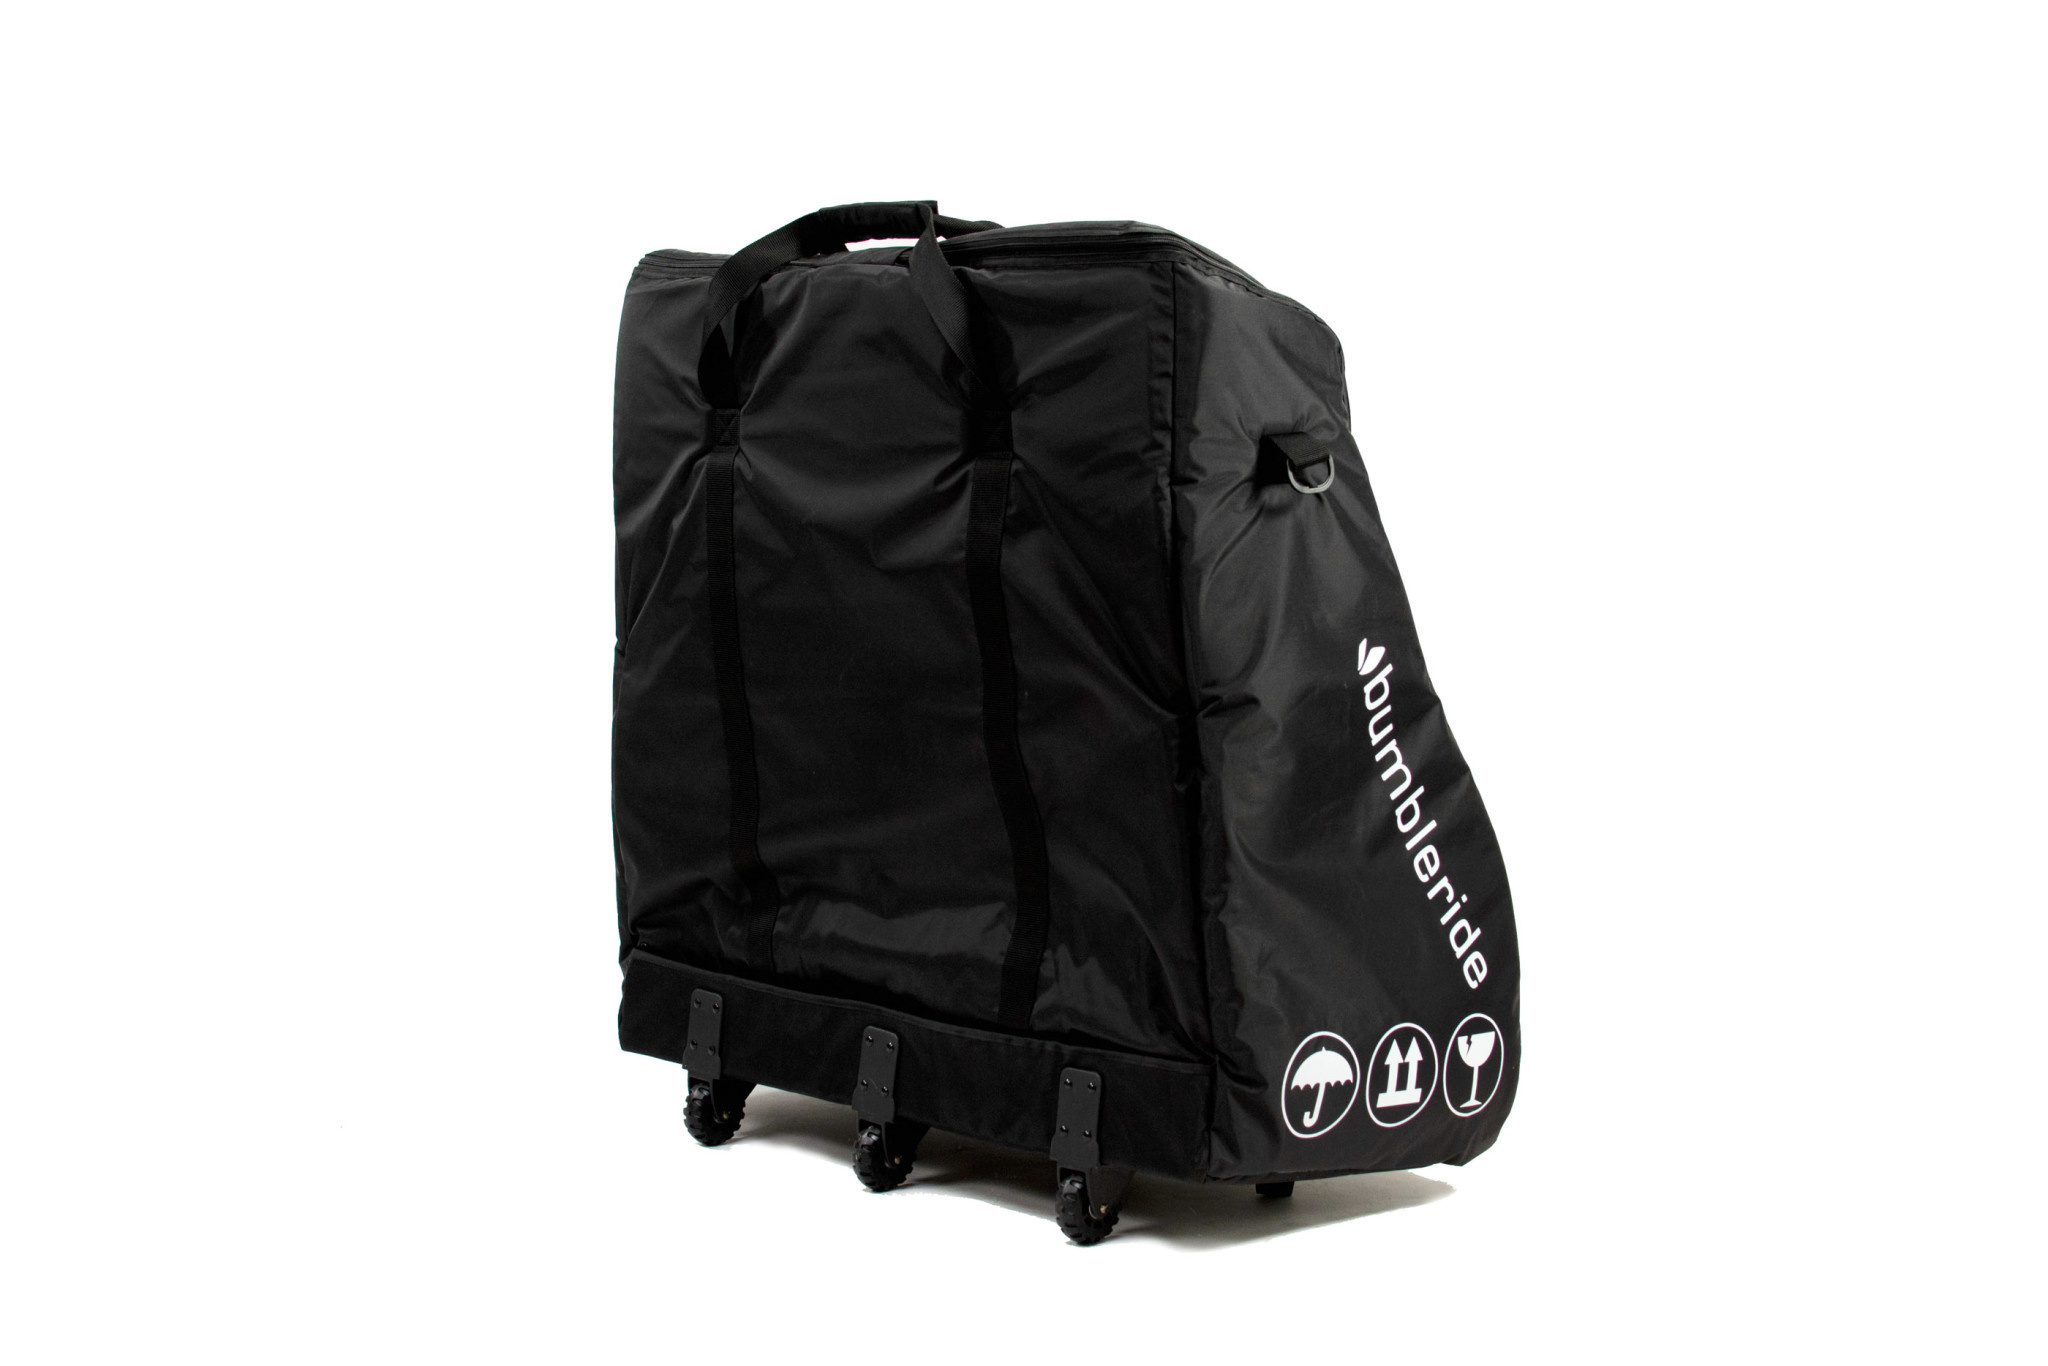 Bumbleride Bumbleride Indie Twin Travel Bag